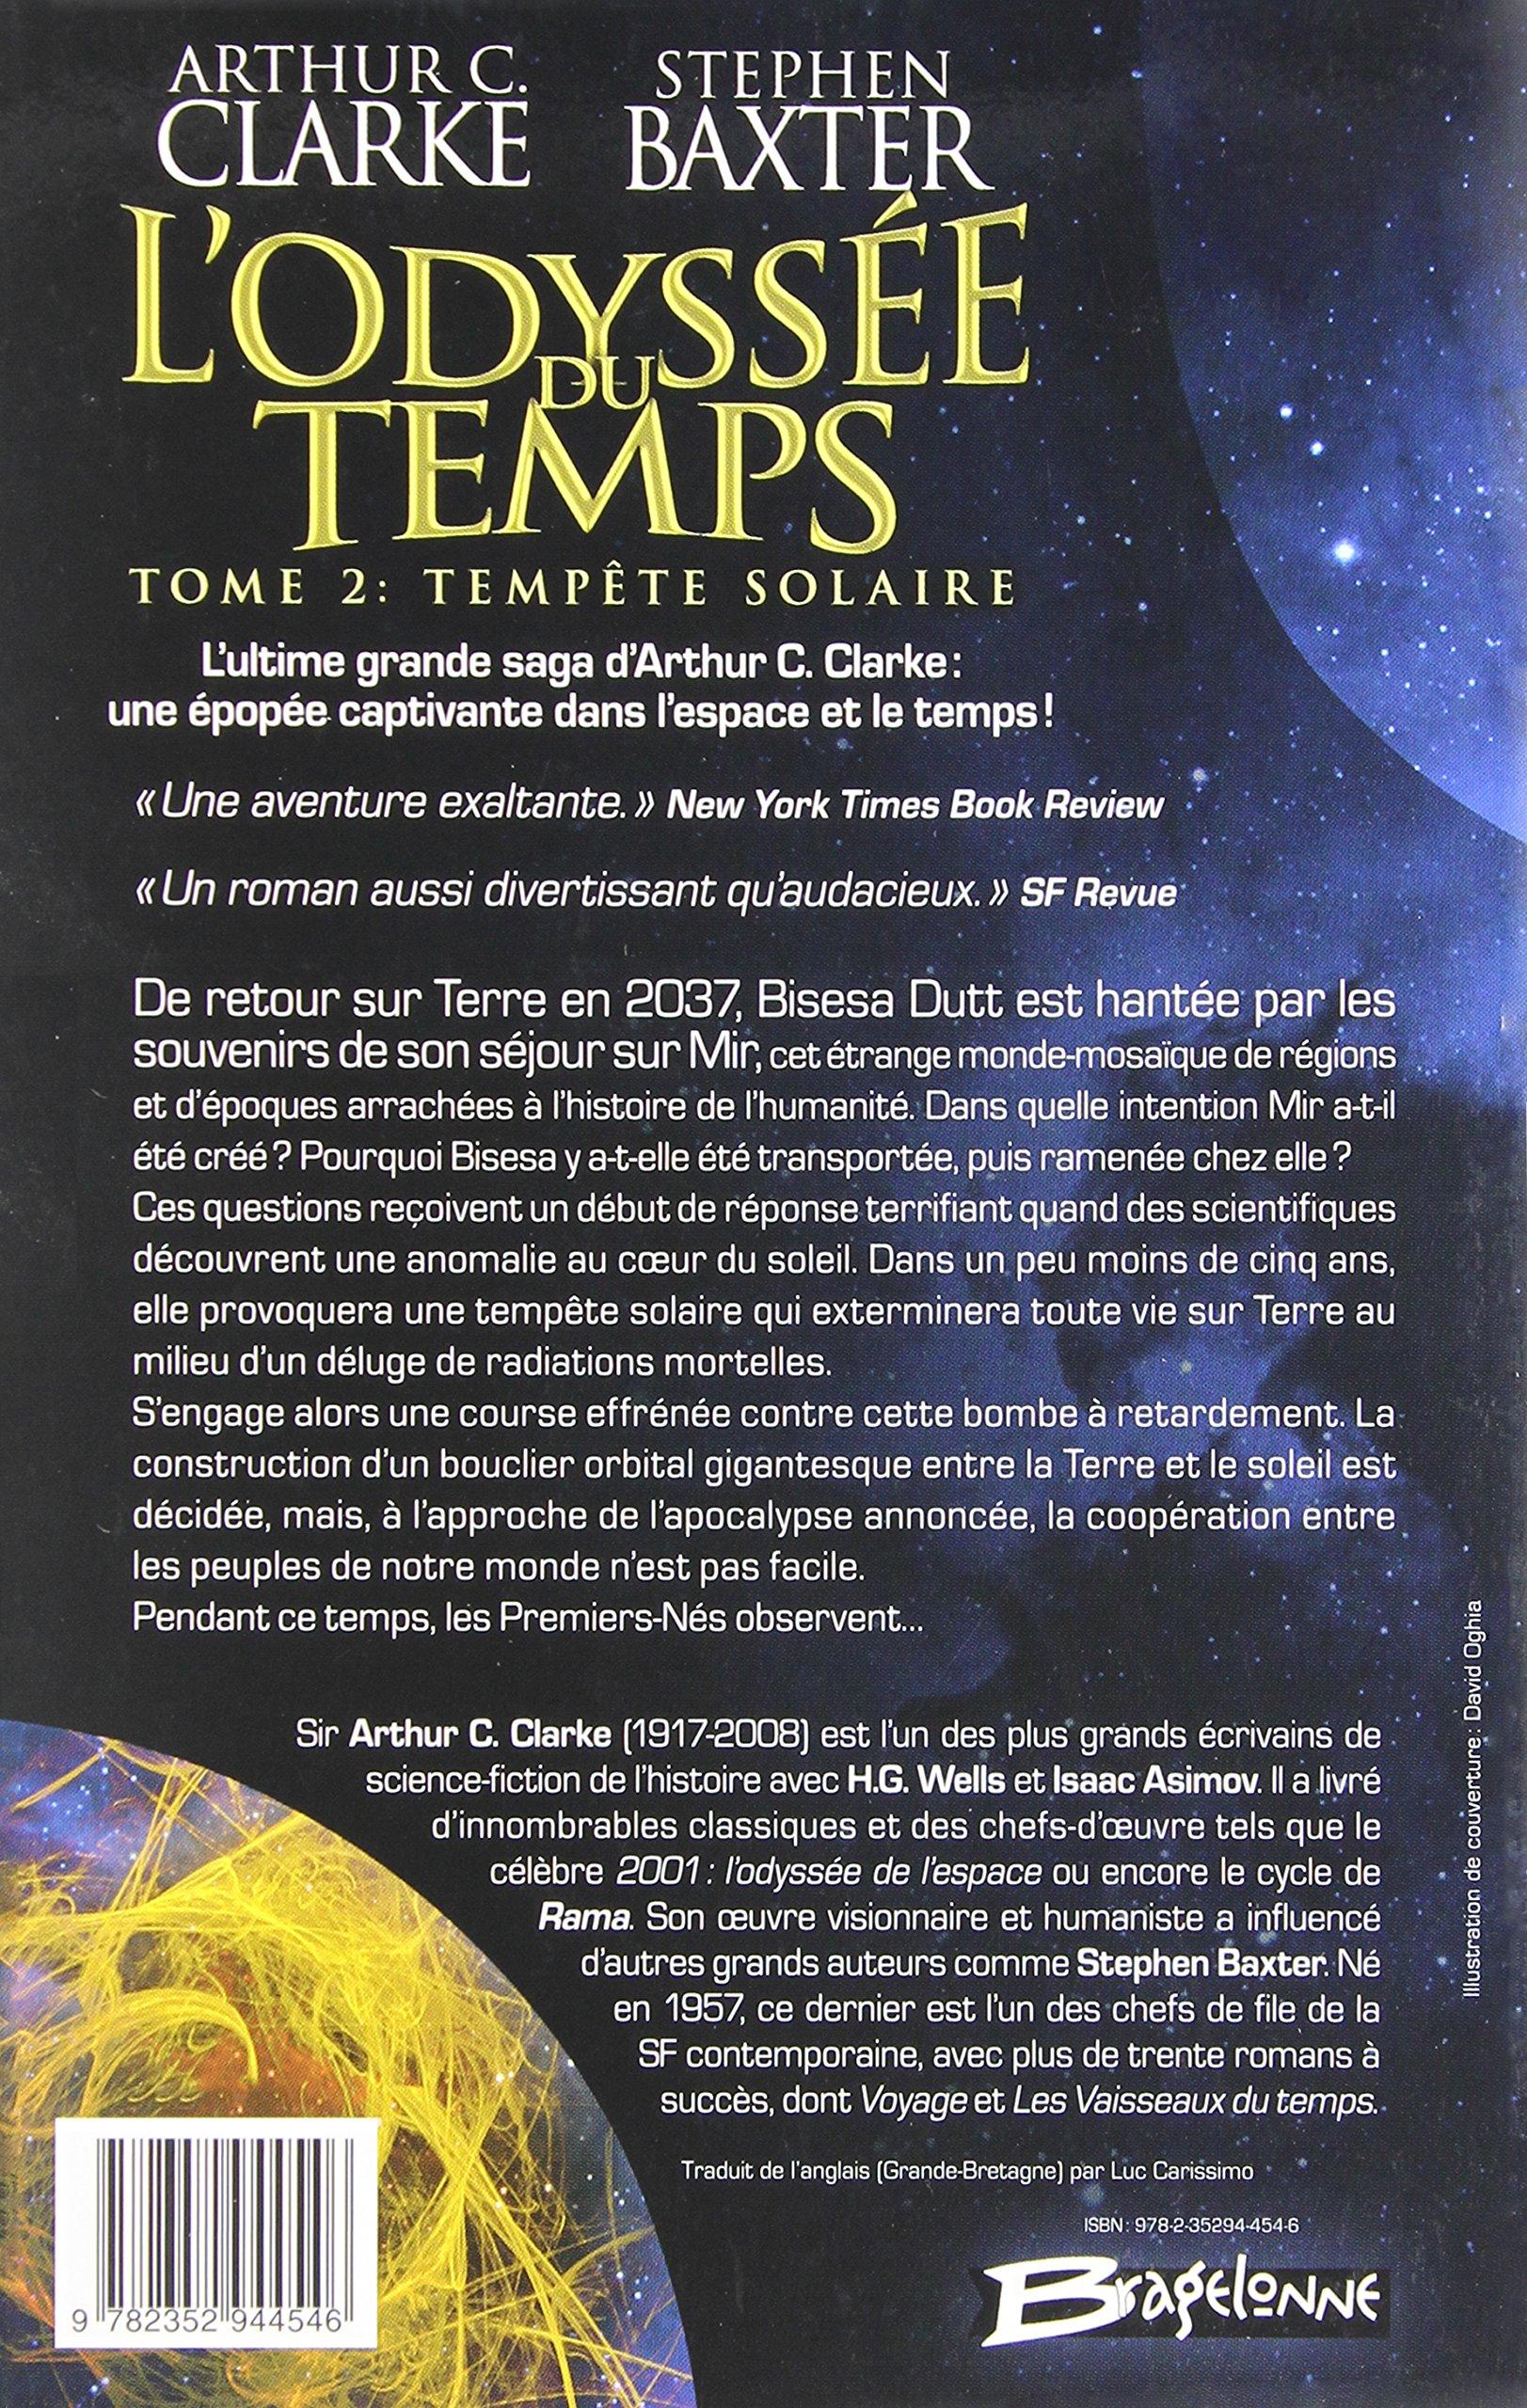 lodyssee du temps tome 2 tempete solaire